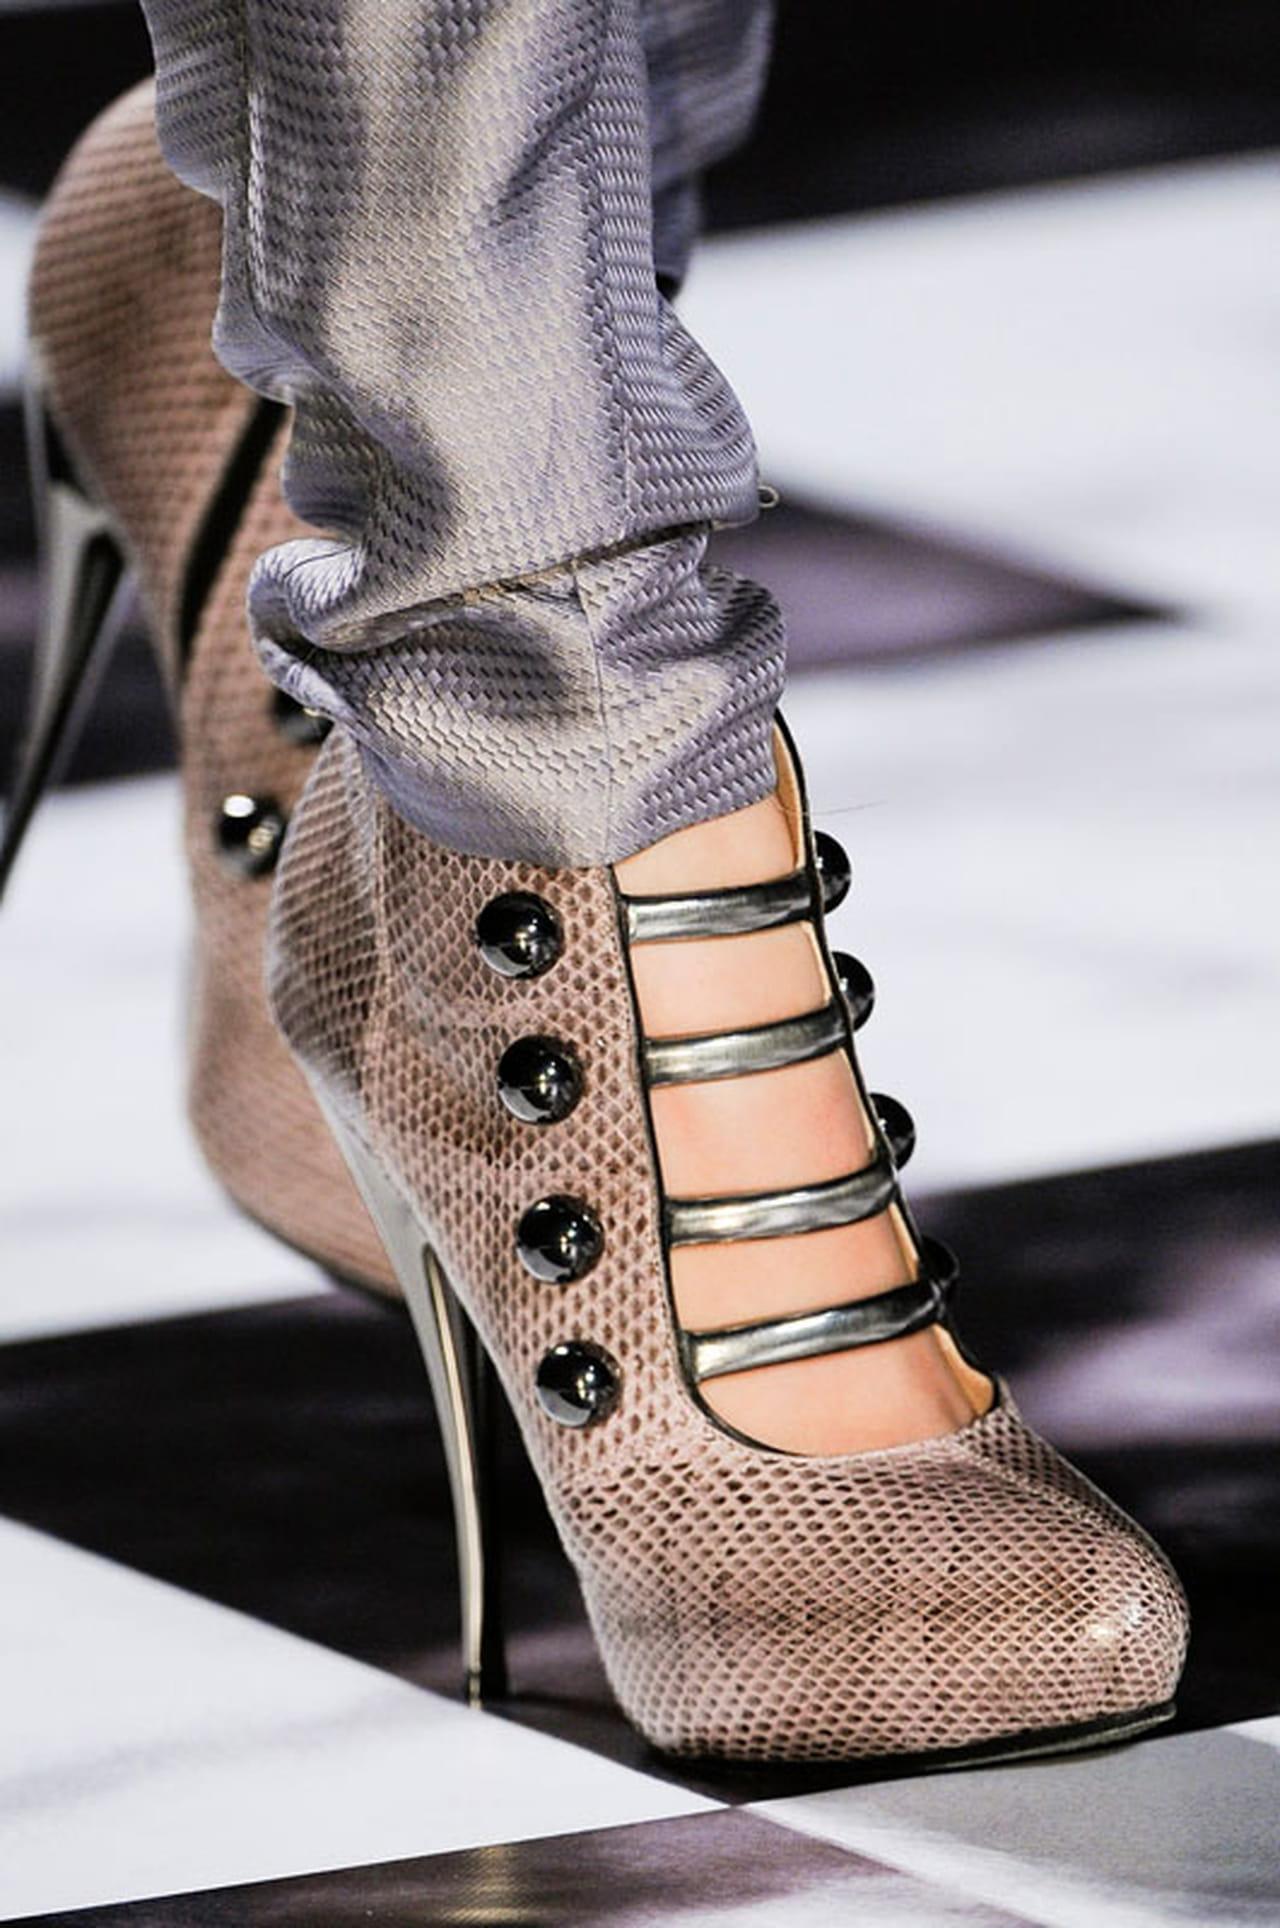 01b6d5c2e513e مجموعة من أجمل أحذية ربيع وصيف 2013